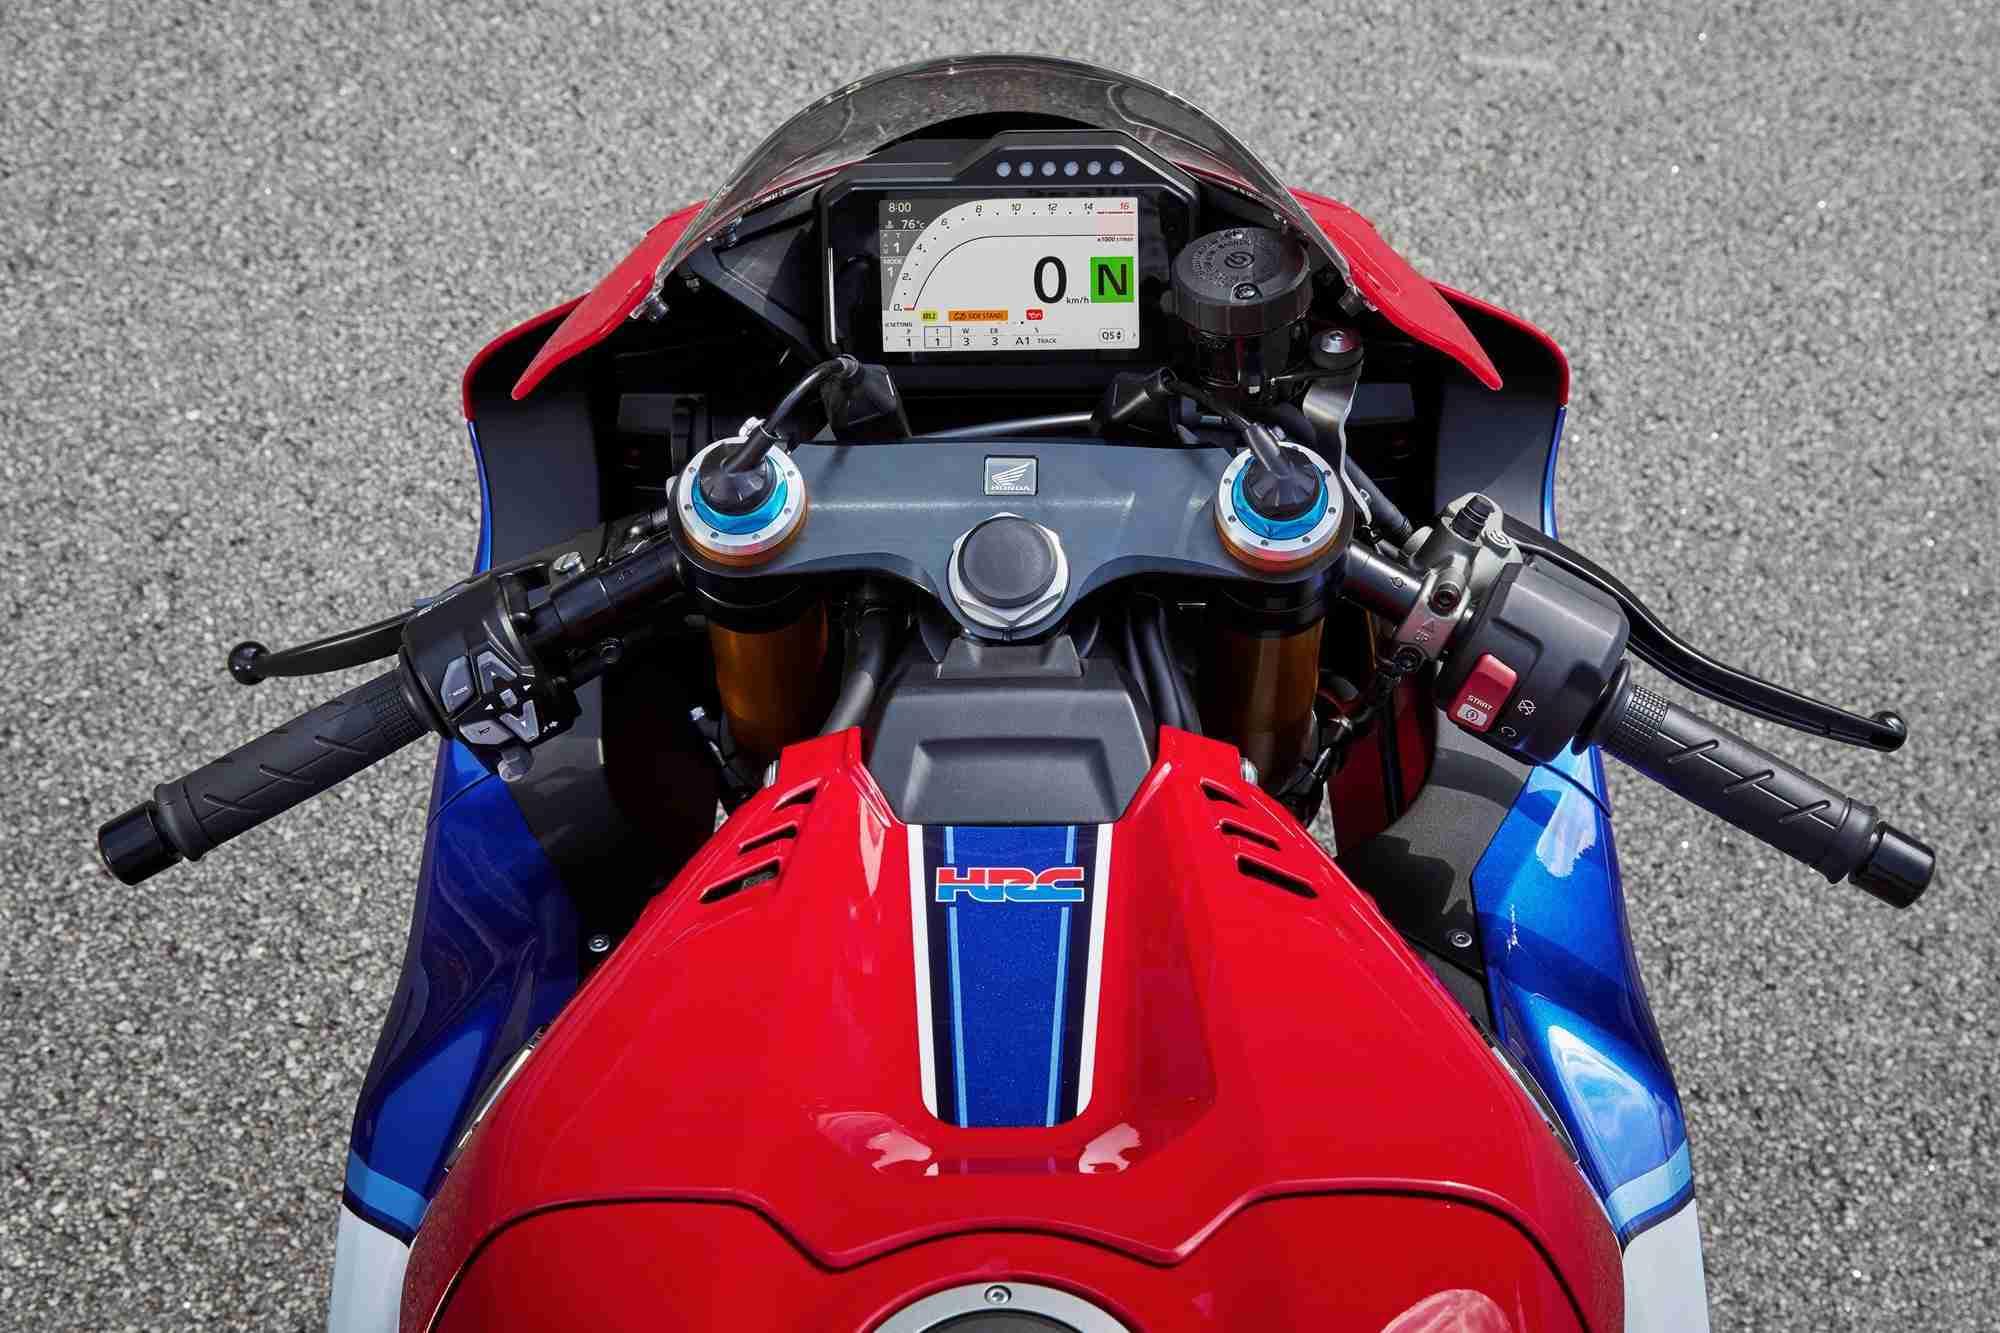 2020 Honda CBR1000RR-R SP Fireblade handlebars cockpit and screen